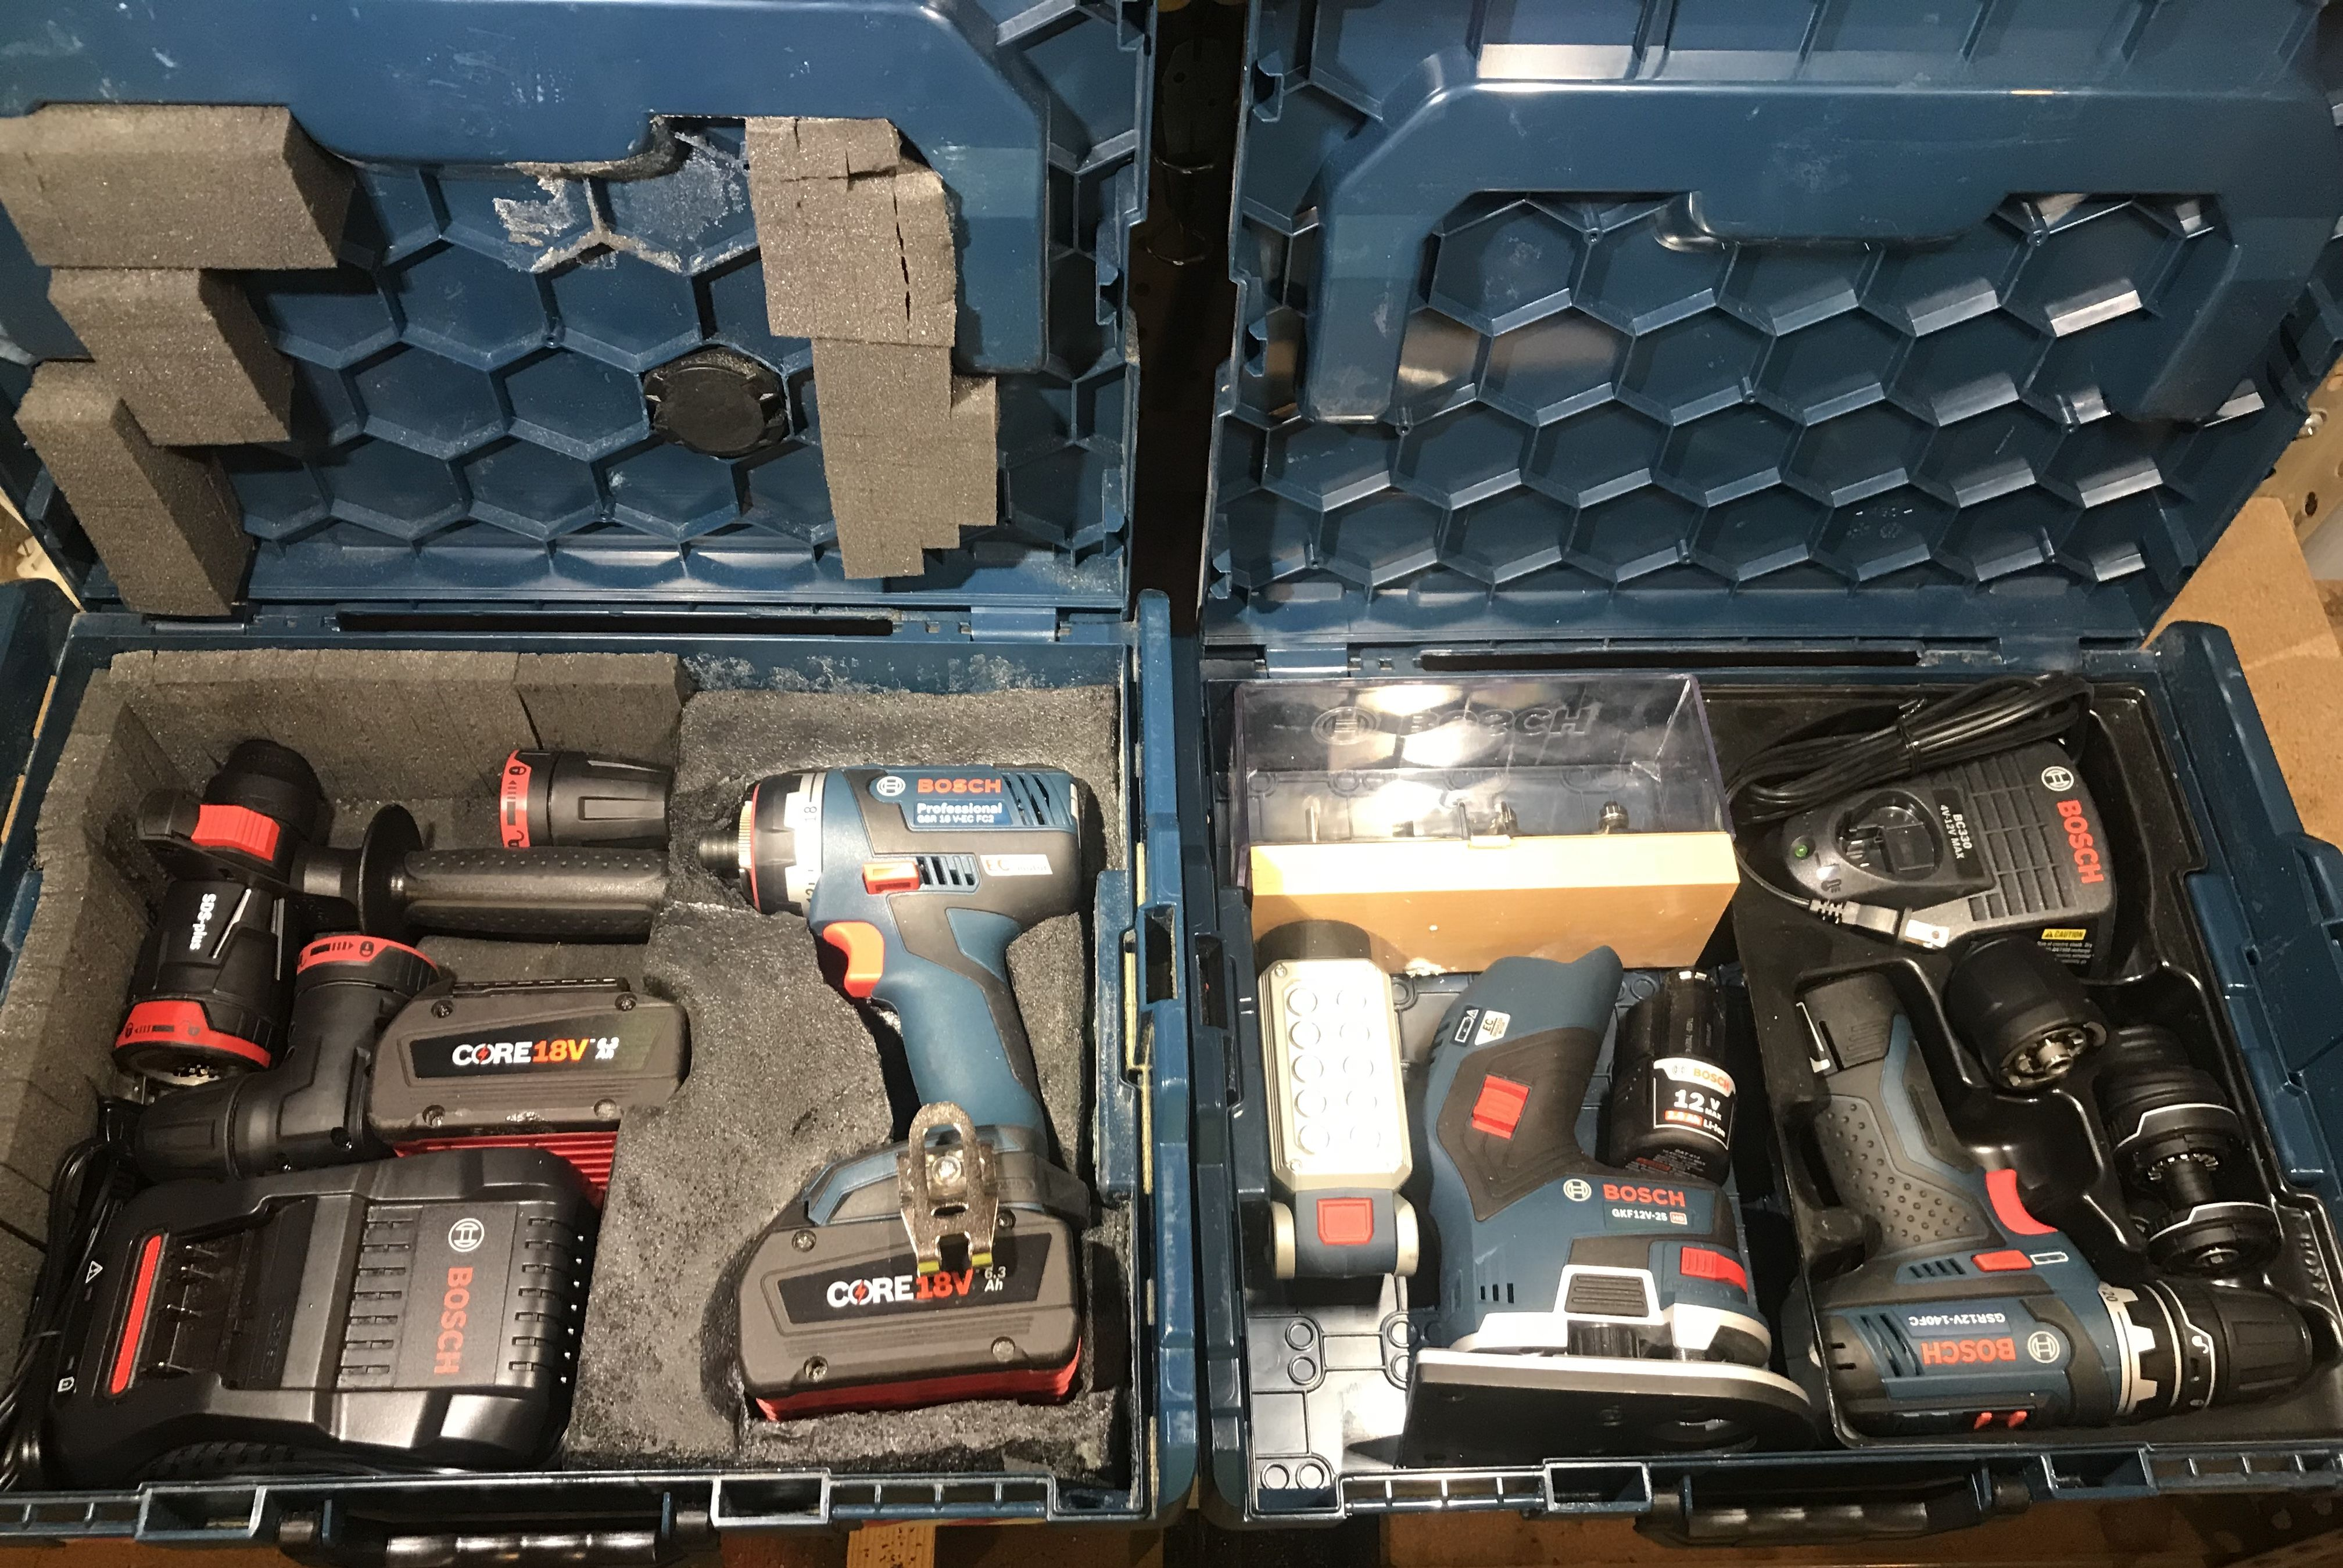 Bosch Professional G Series L Boxx 1 Gsr12v 140fc Gkf12v 25 Fl12 4pc Router Bit Set Bc330 3x 2 0ah 12v Bosch Professional Diy Und Selbermachen Selbermachen